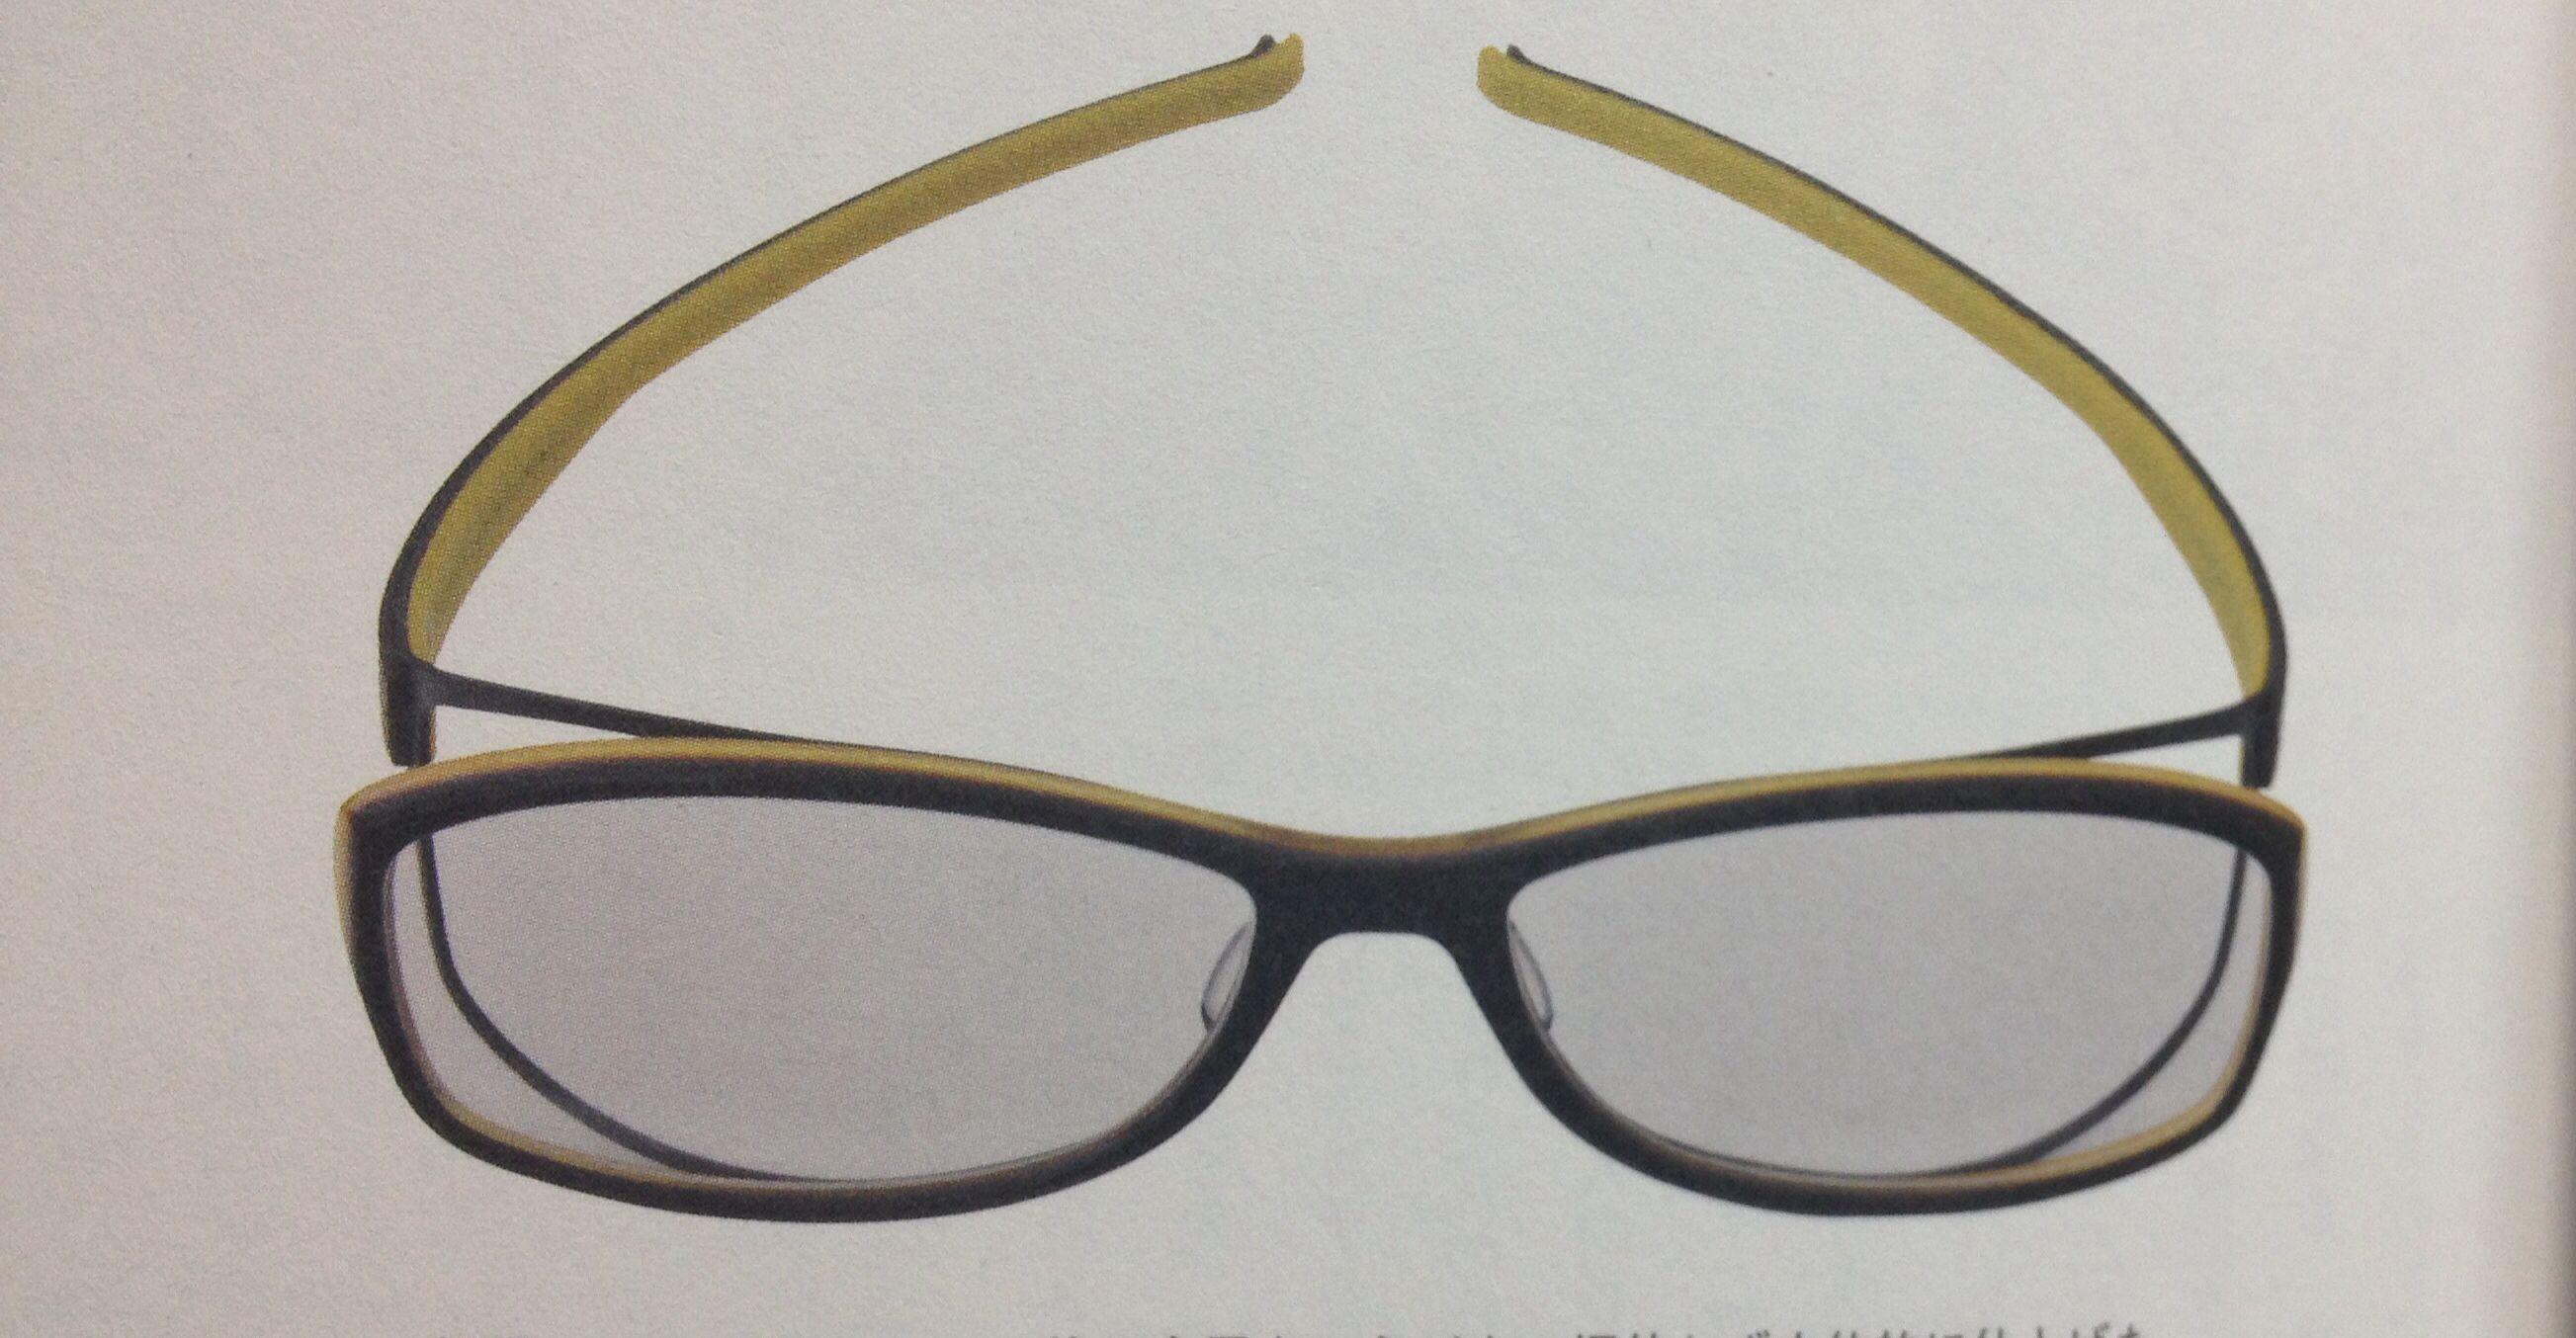 Eyewear Frames From Japan : Glasses ( opt.duo ) , japan ?????? eyewear Pinterest